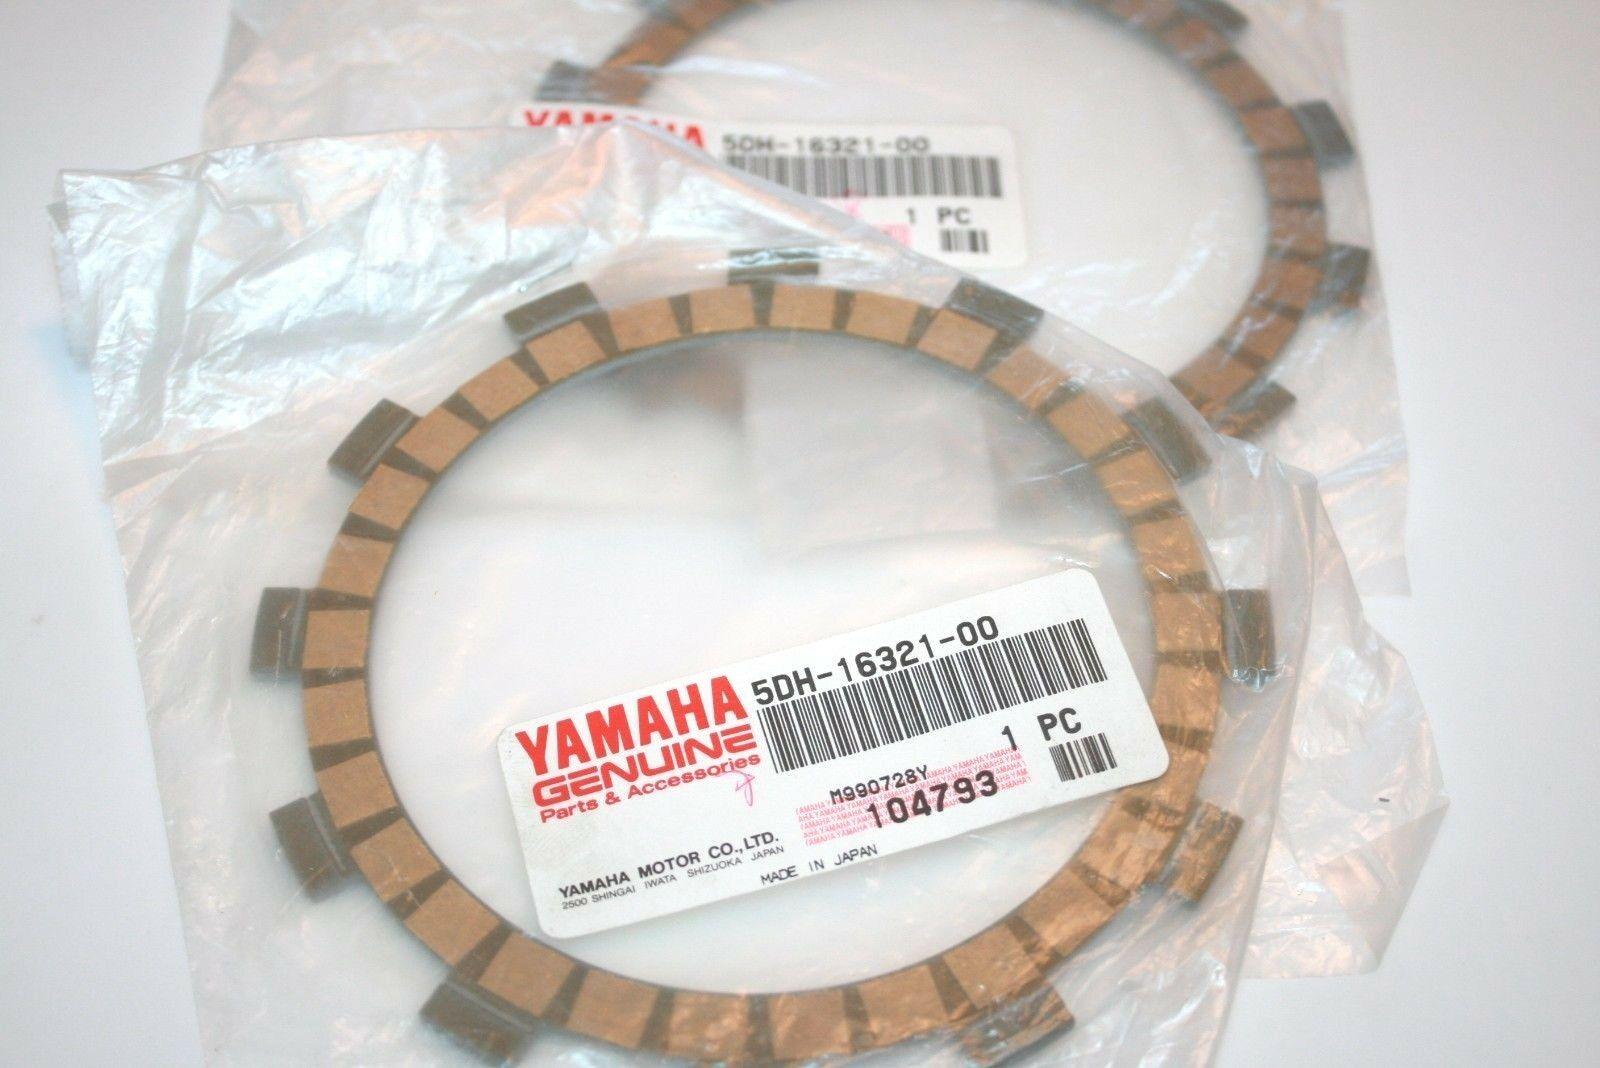 discos embrague yamaha 5dh-16321-00 yz125 98/04 (8)yzf25001/07 orig